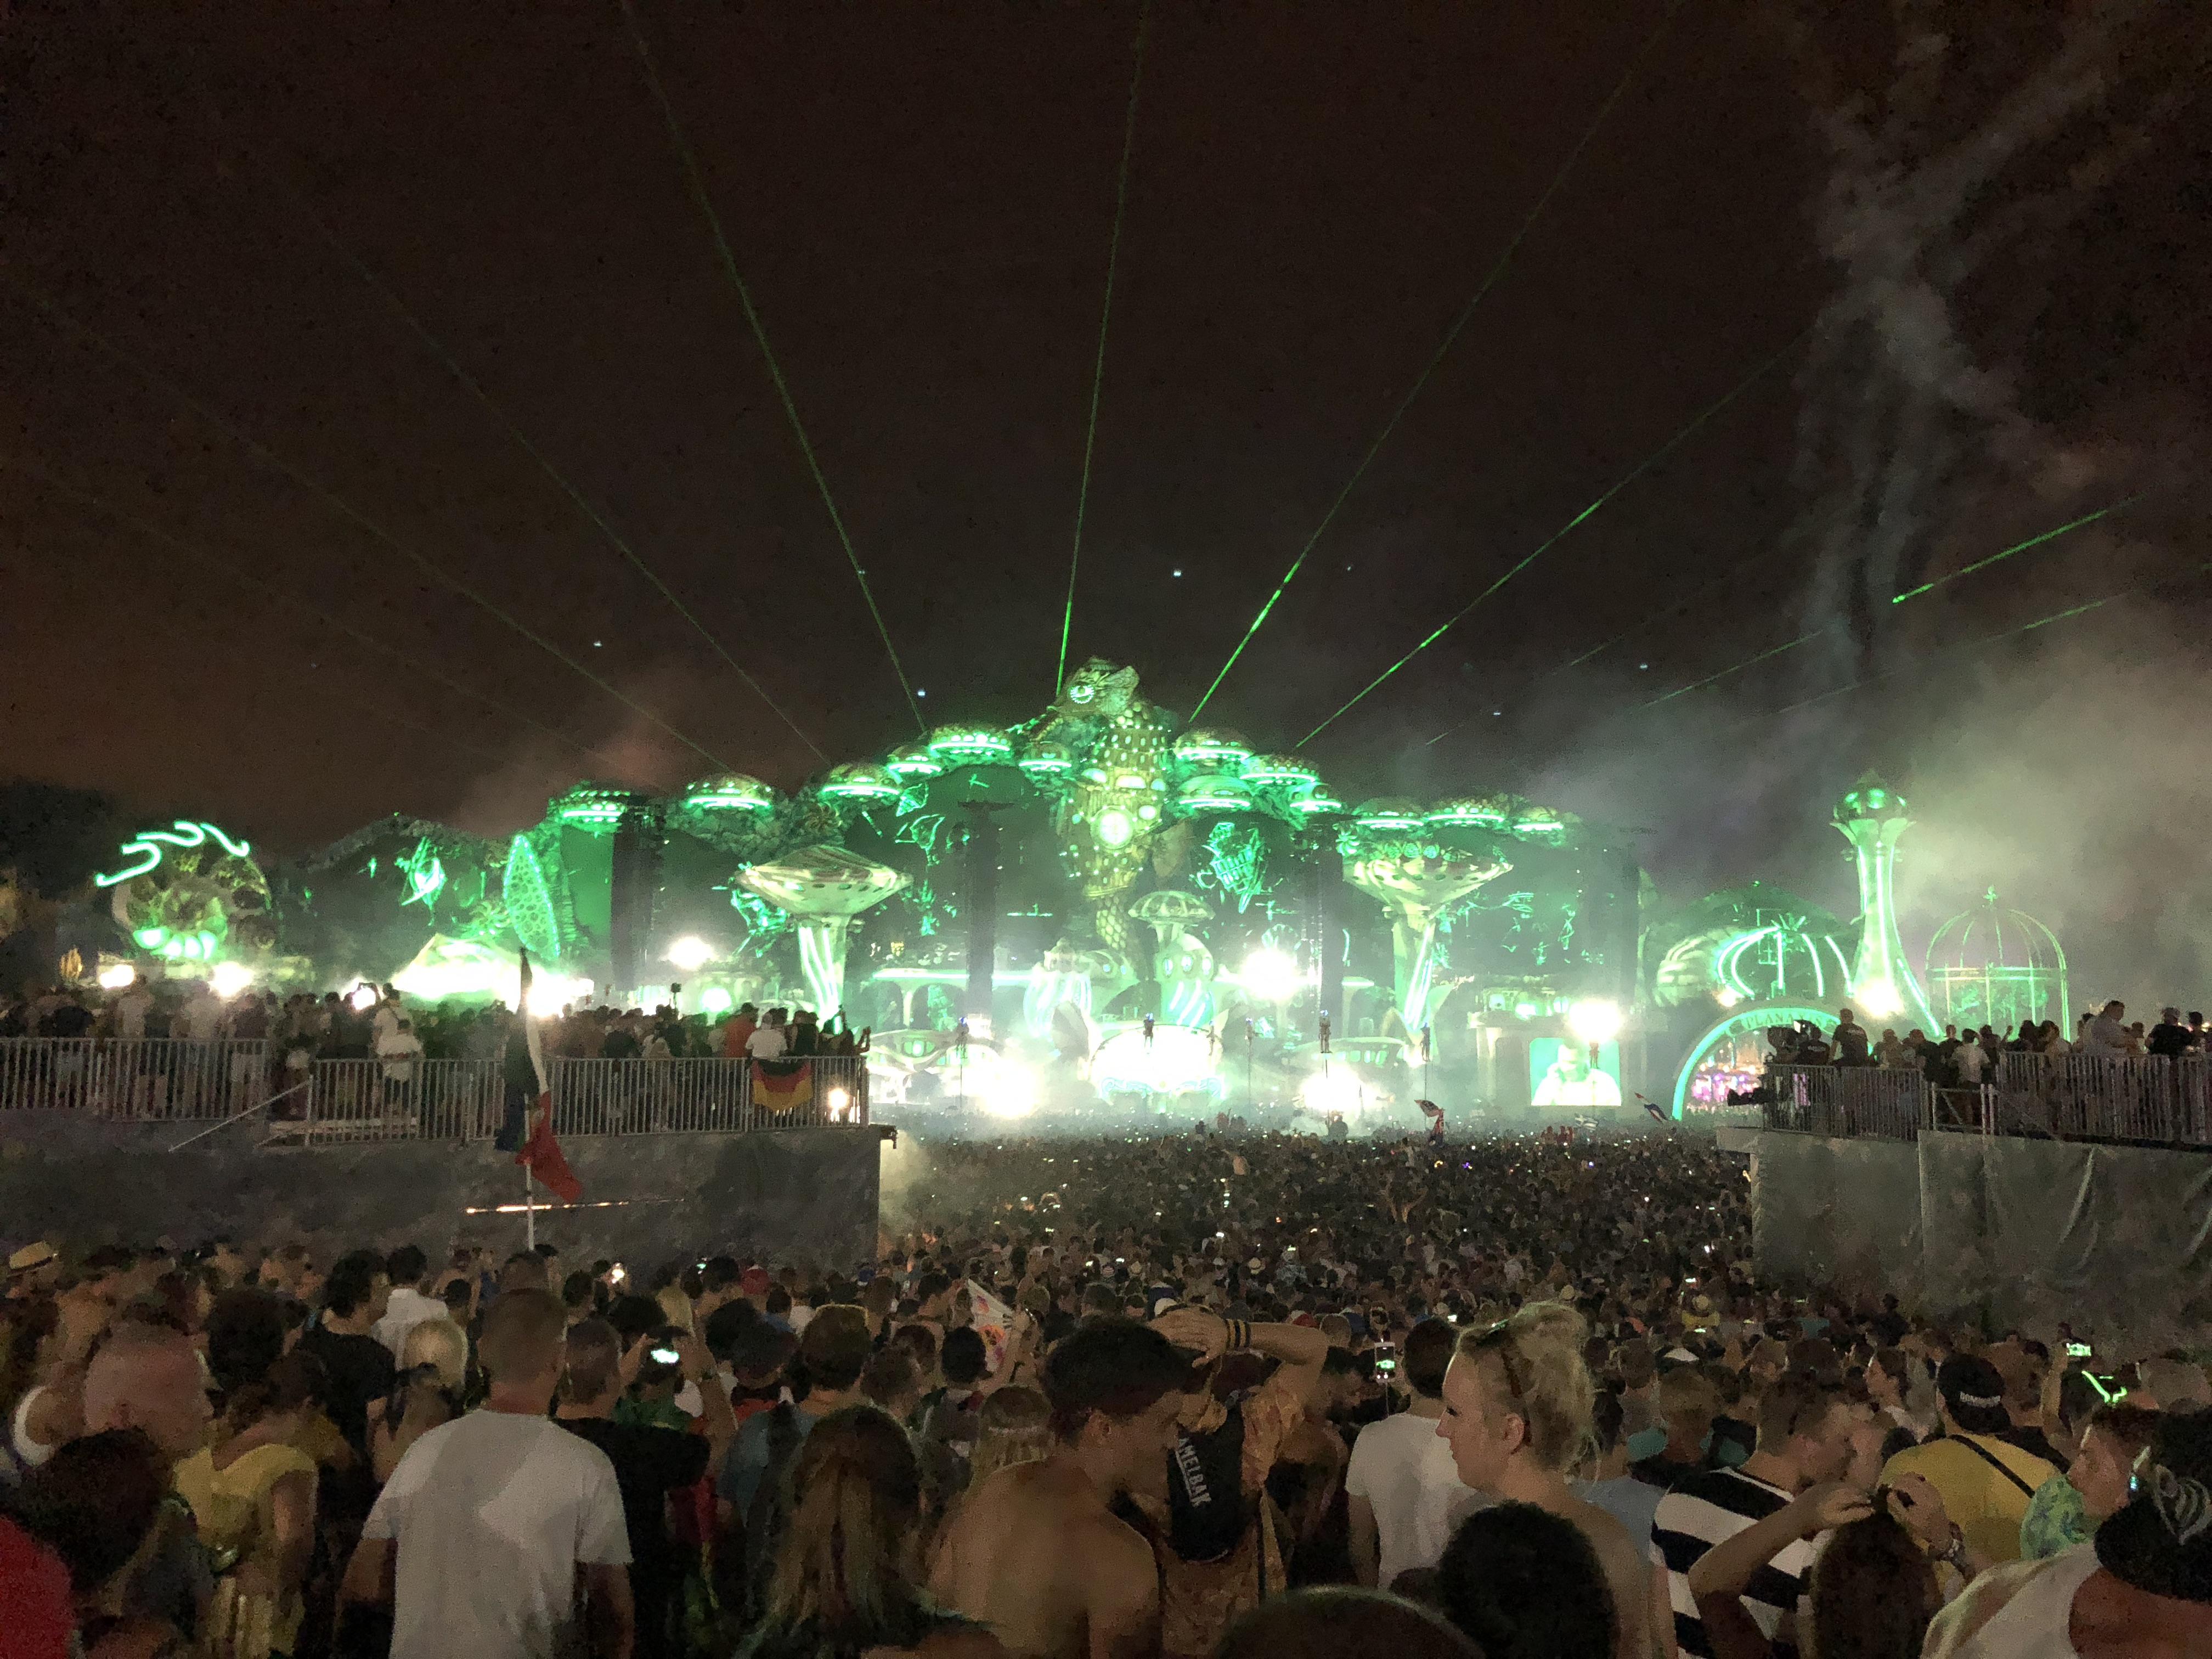 File:Tomorrowland 2018 Main Stage jpg - Wikimedia Commons